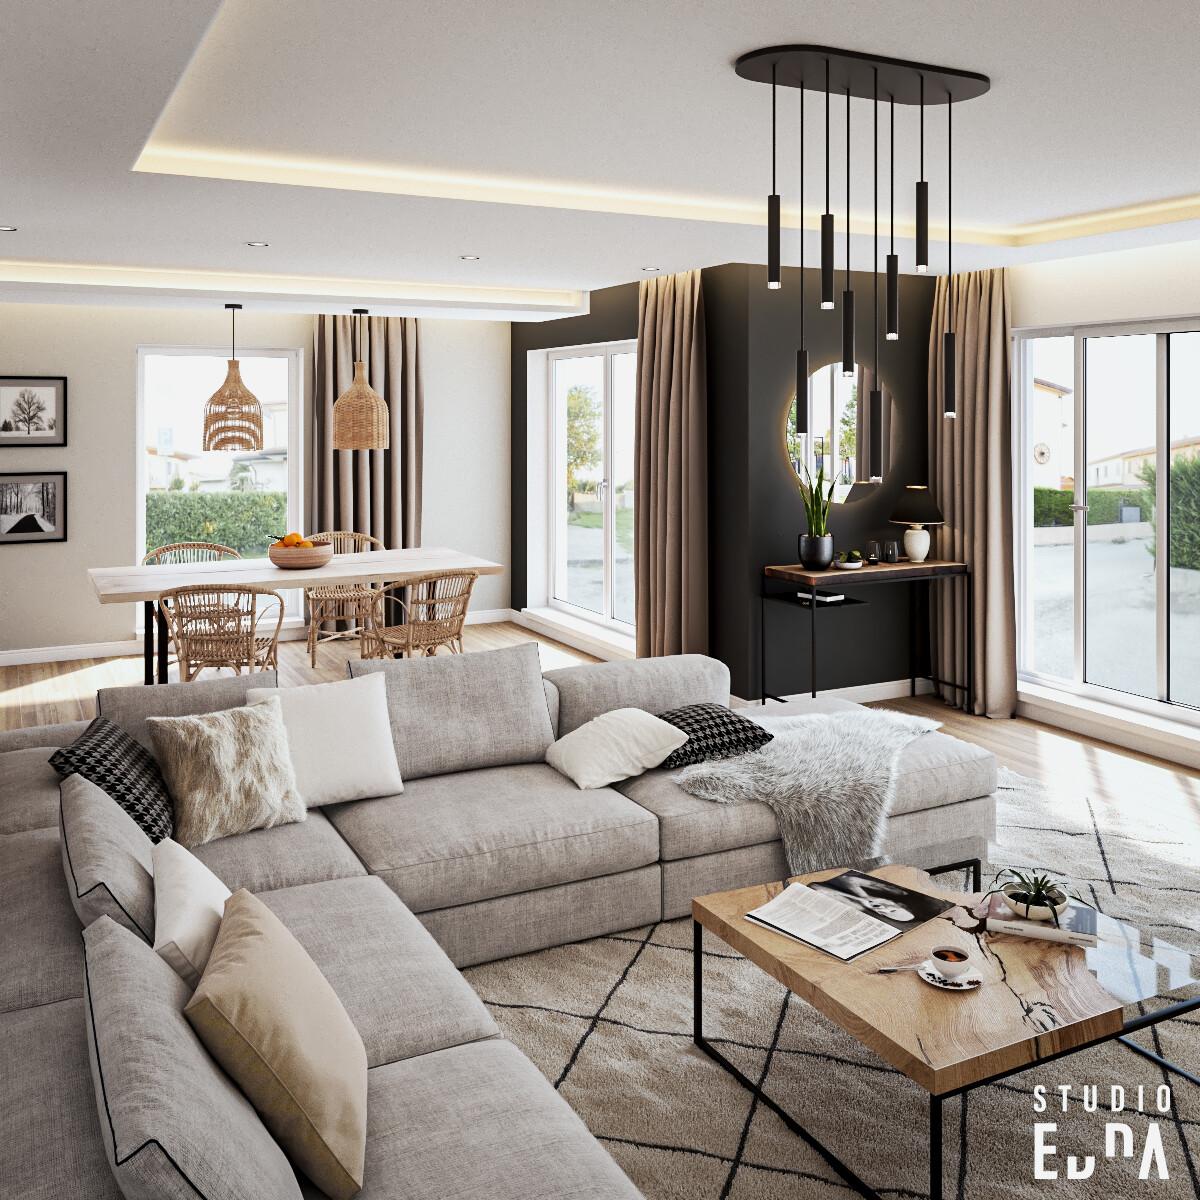 Studio Edna CG - Interior Design - Living Room